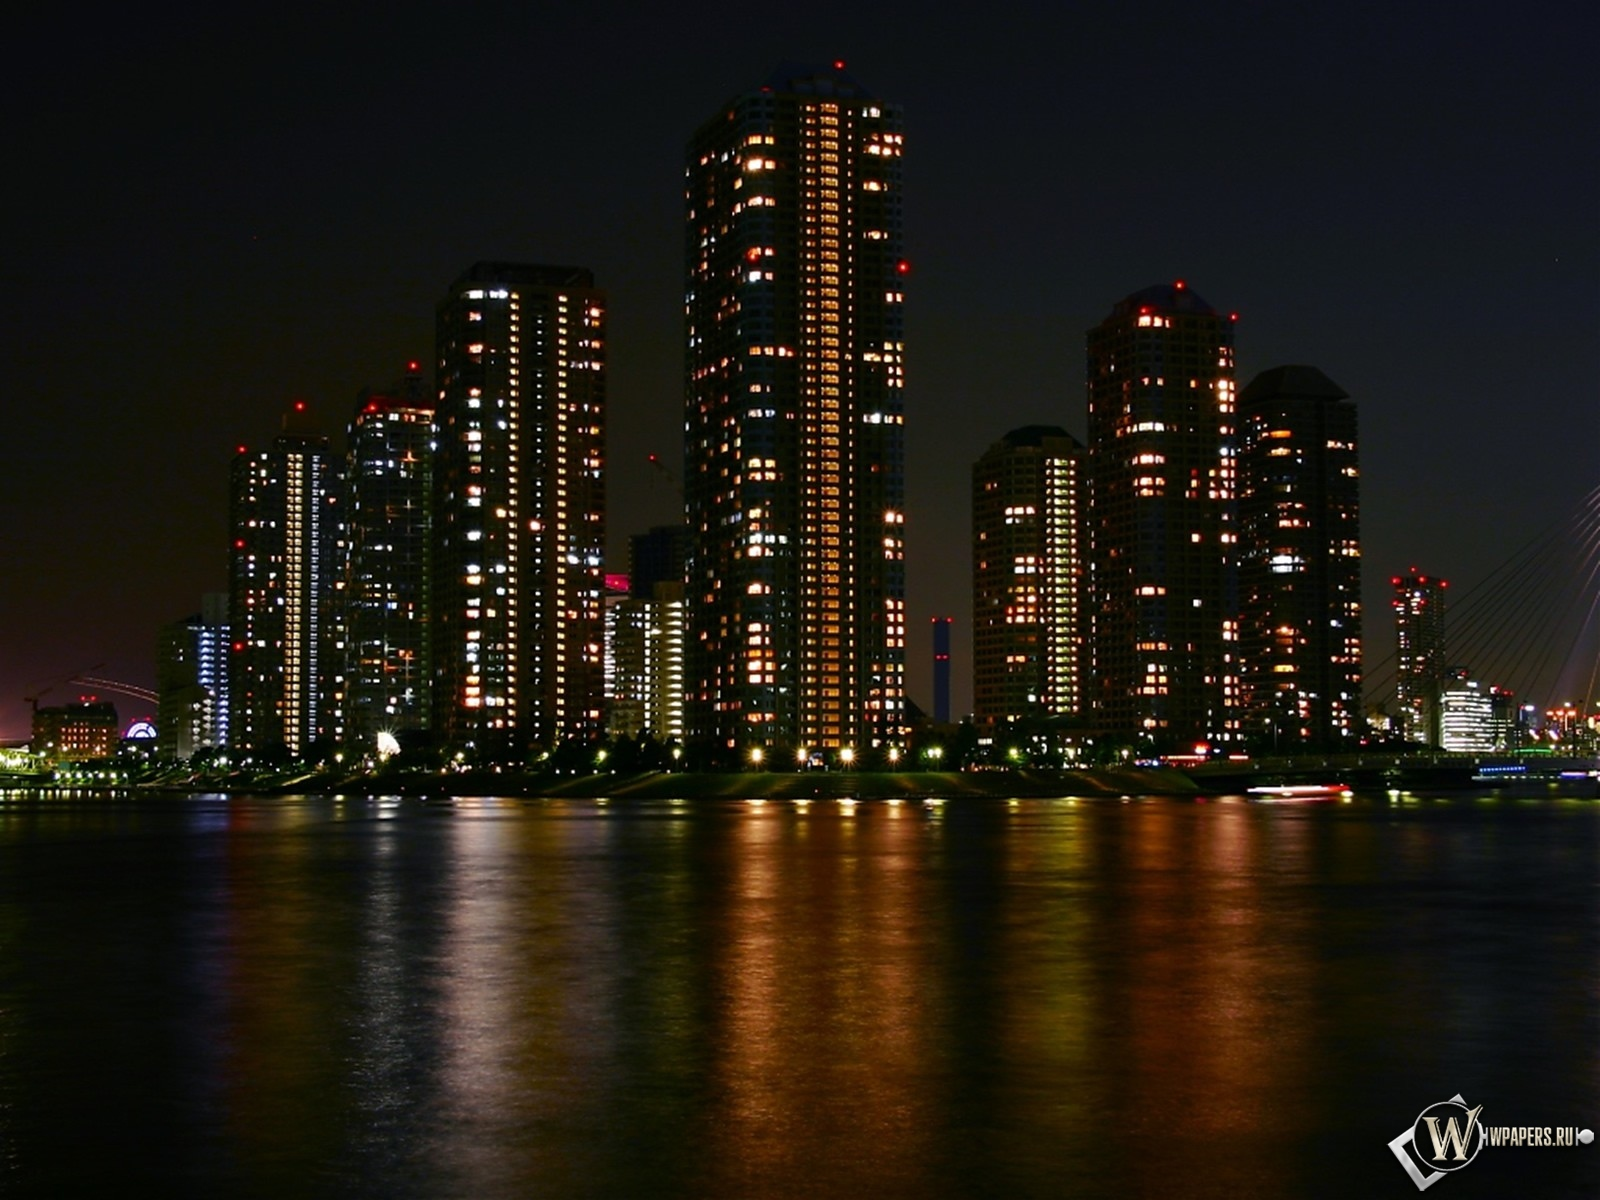 Water City 1600x1200